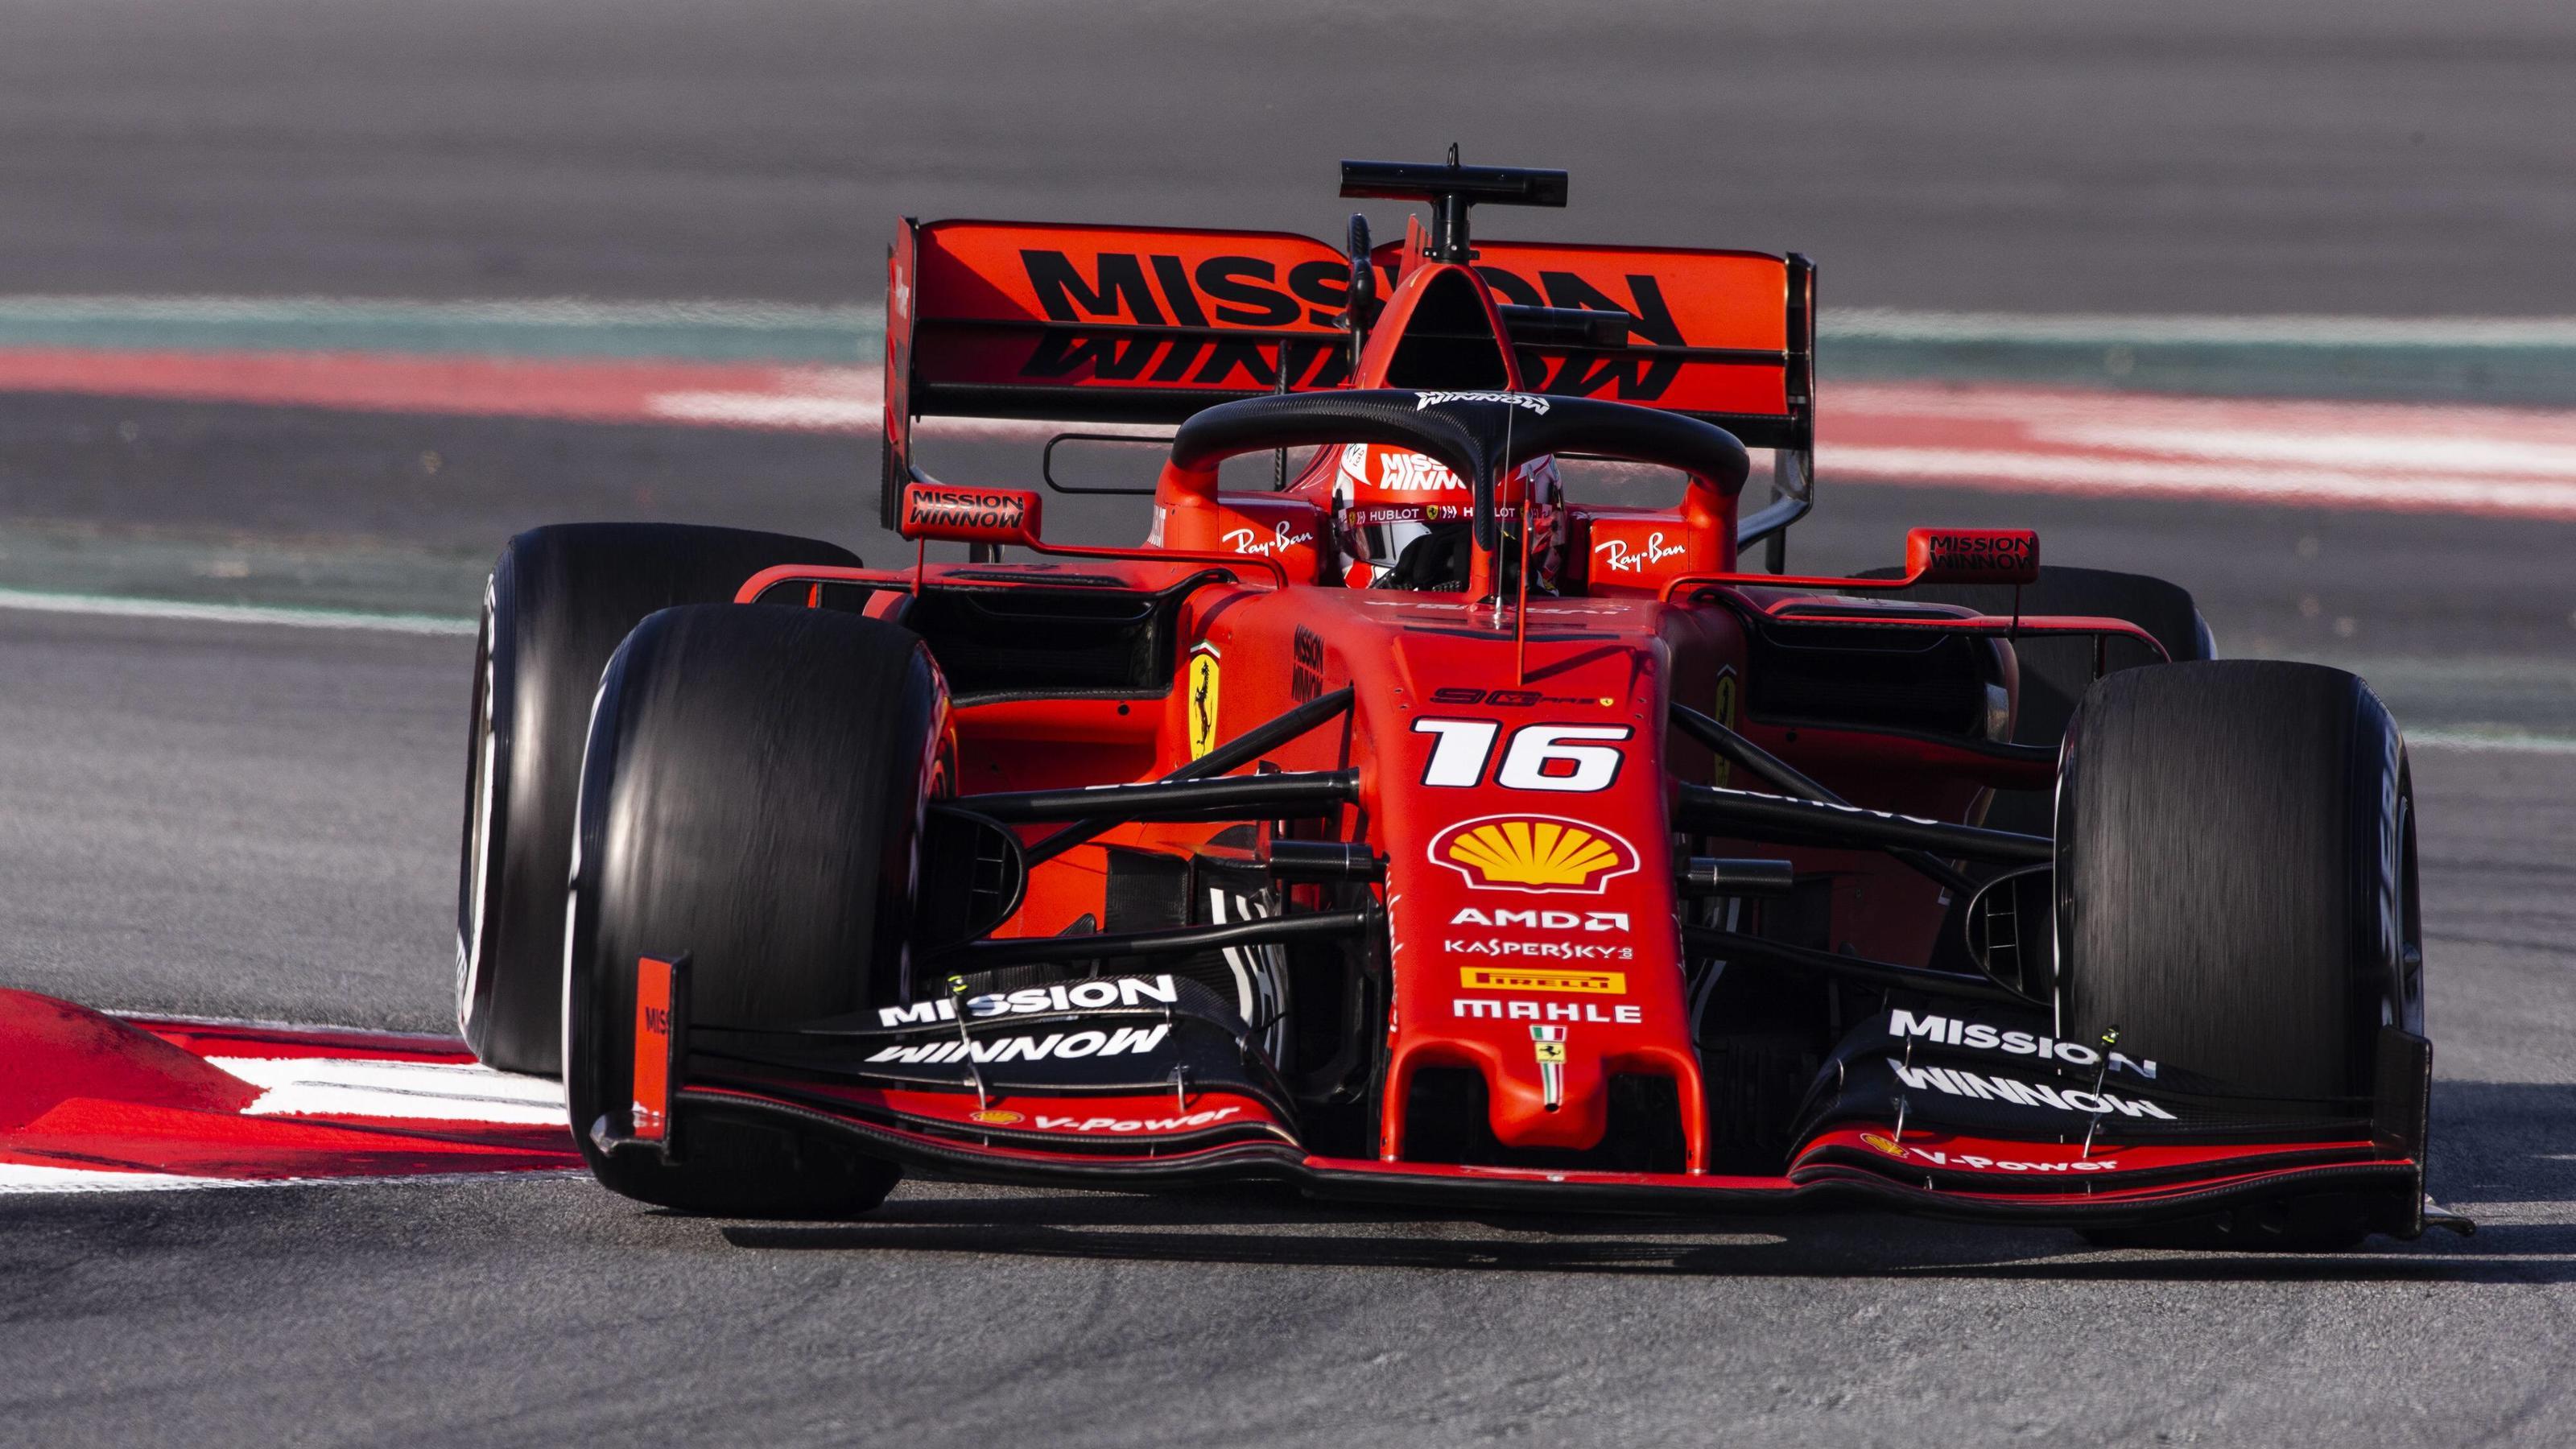 Formel 1 Rtl Programm